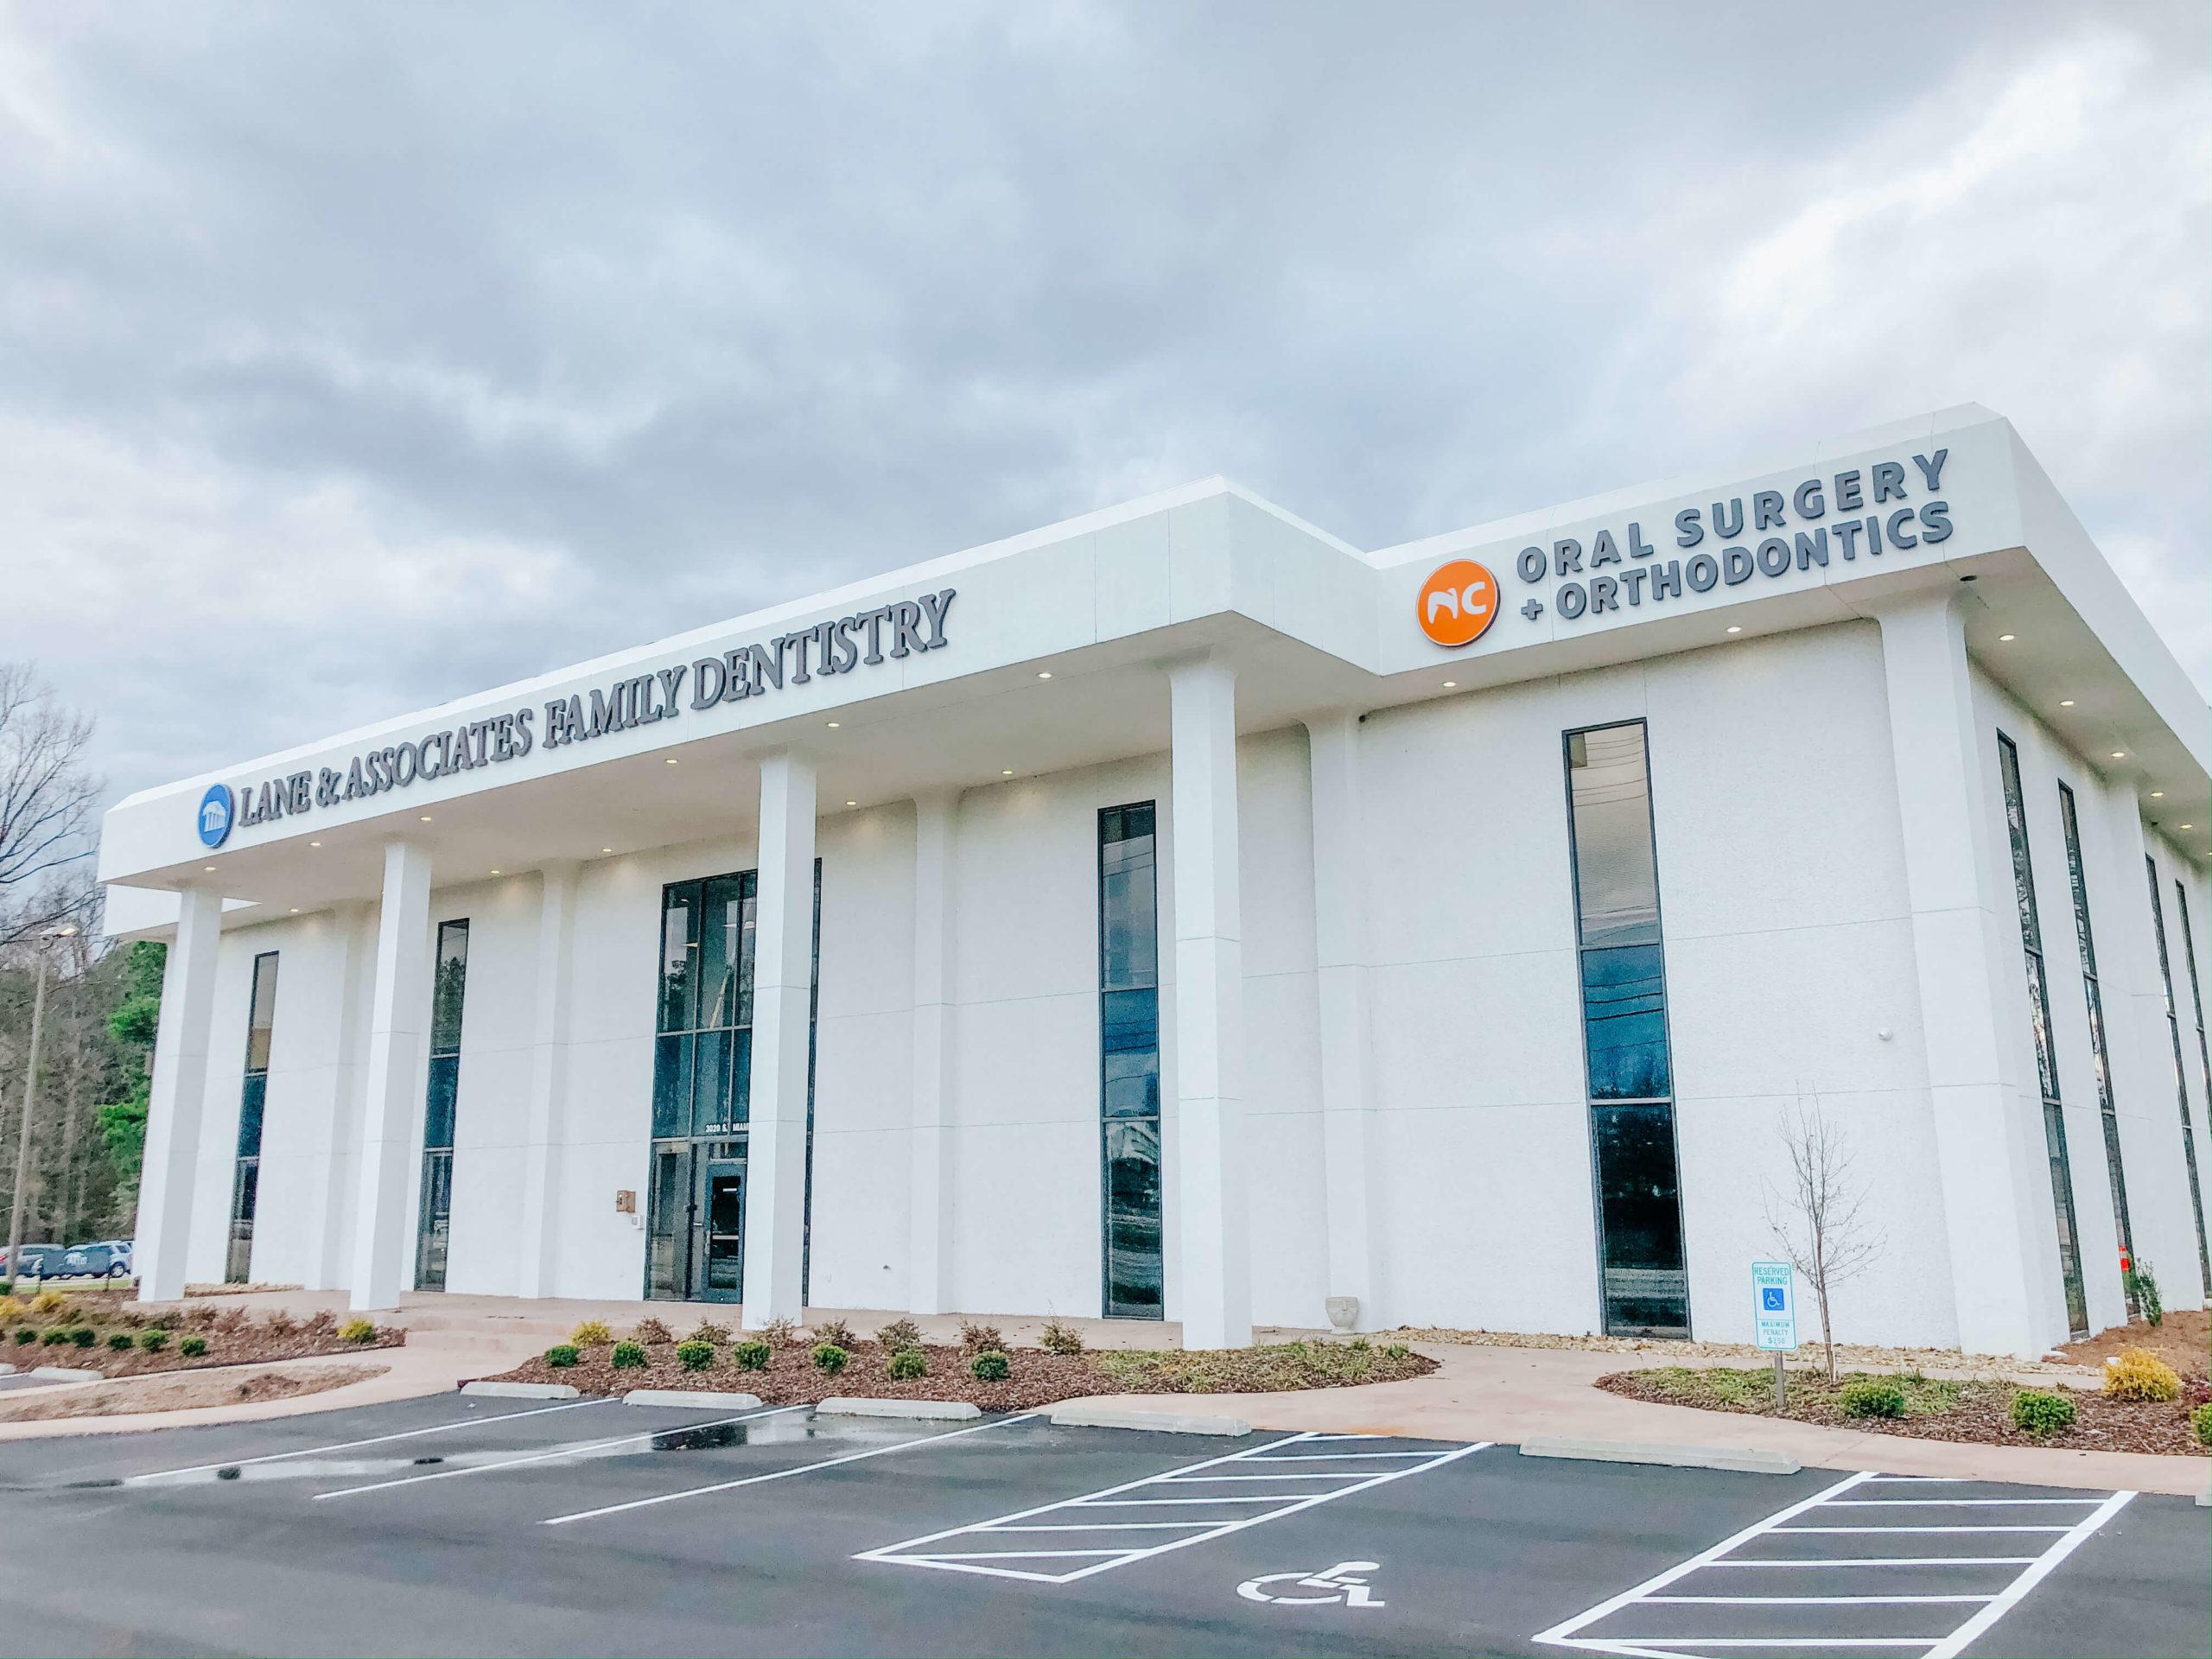 Durham Miami dental office